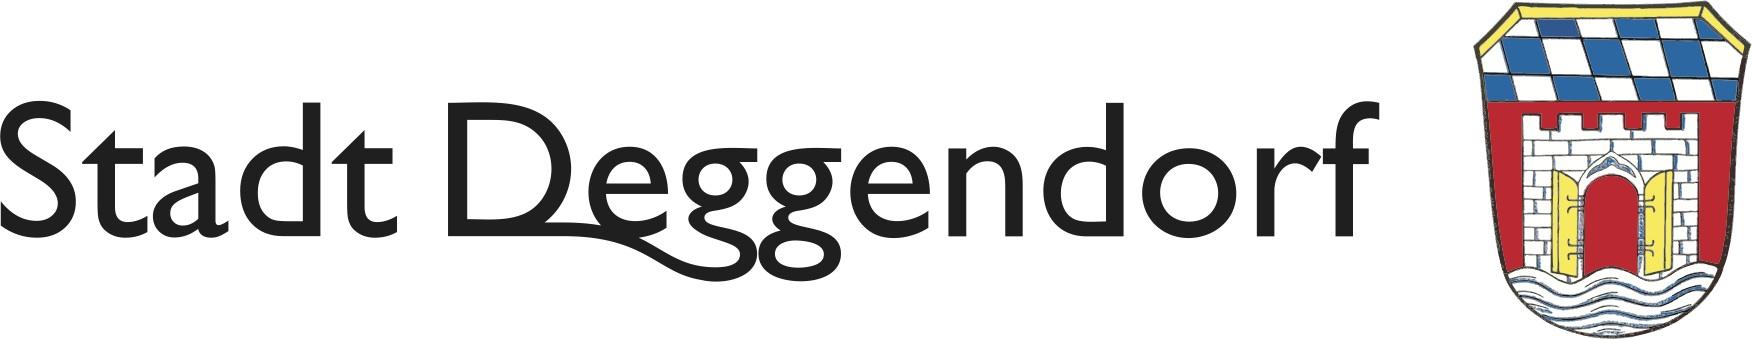 Logo_Stadt Deggendorf_mit Wappen 4c